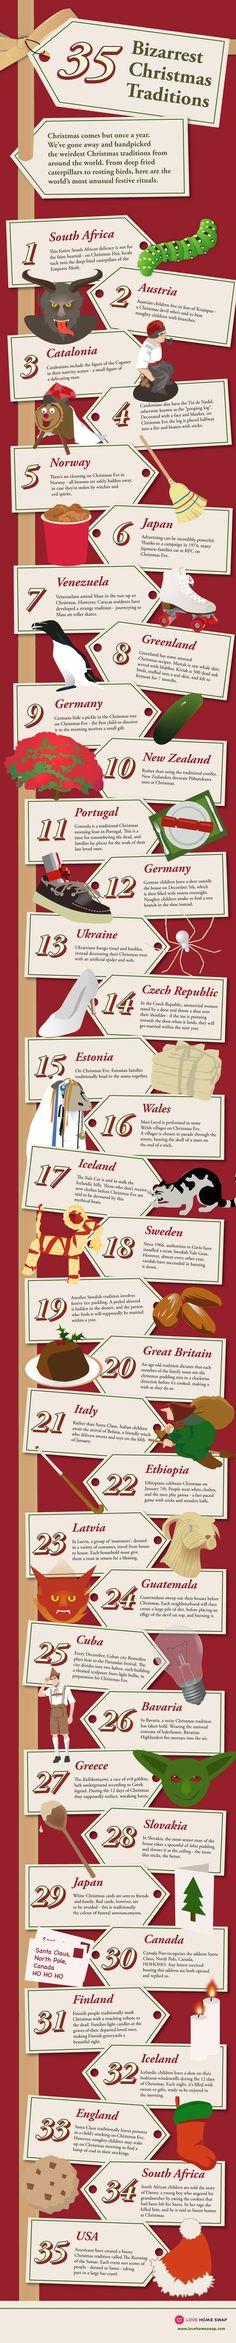 35 Bizarrest Christmas Traditions - interesting!